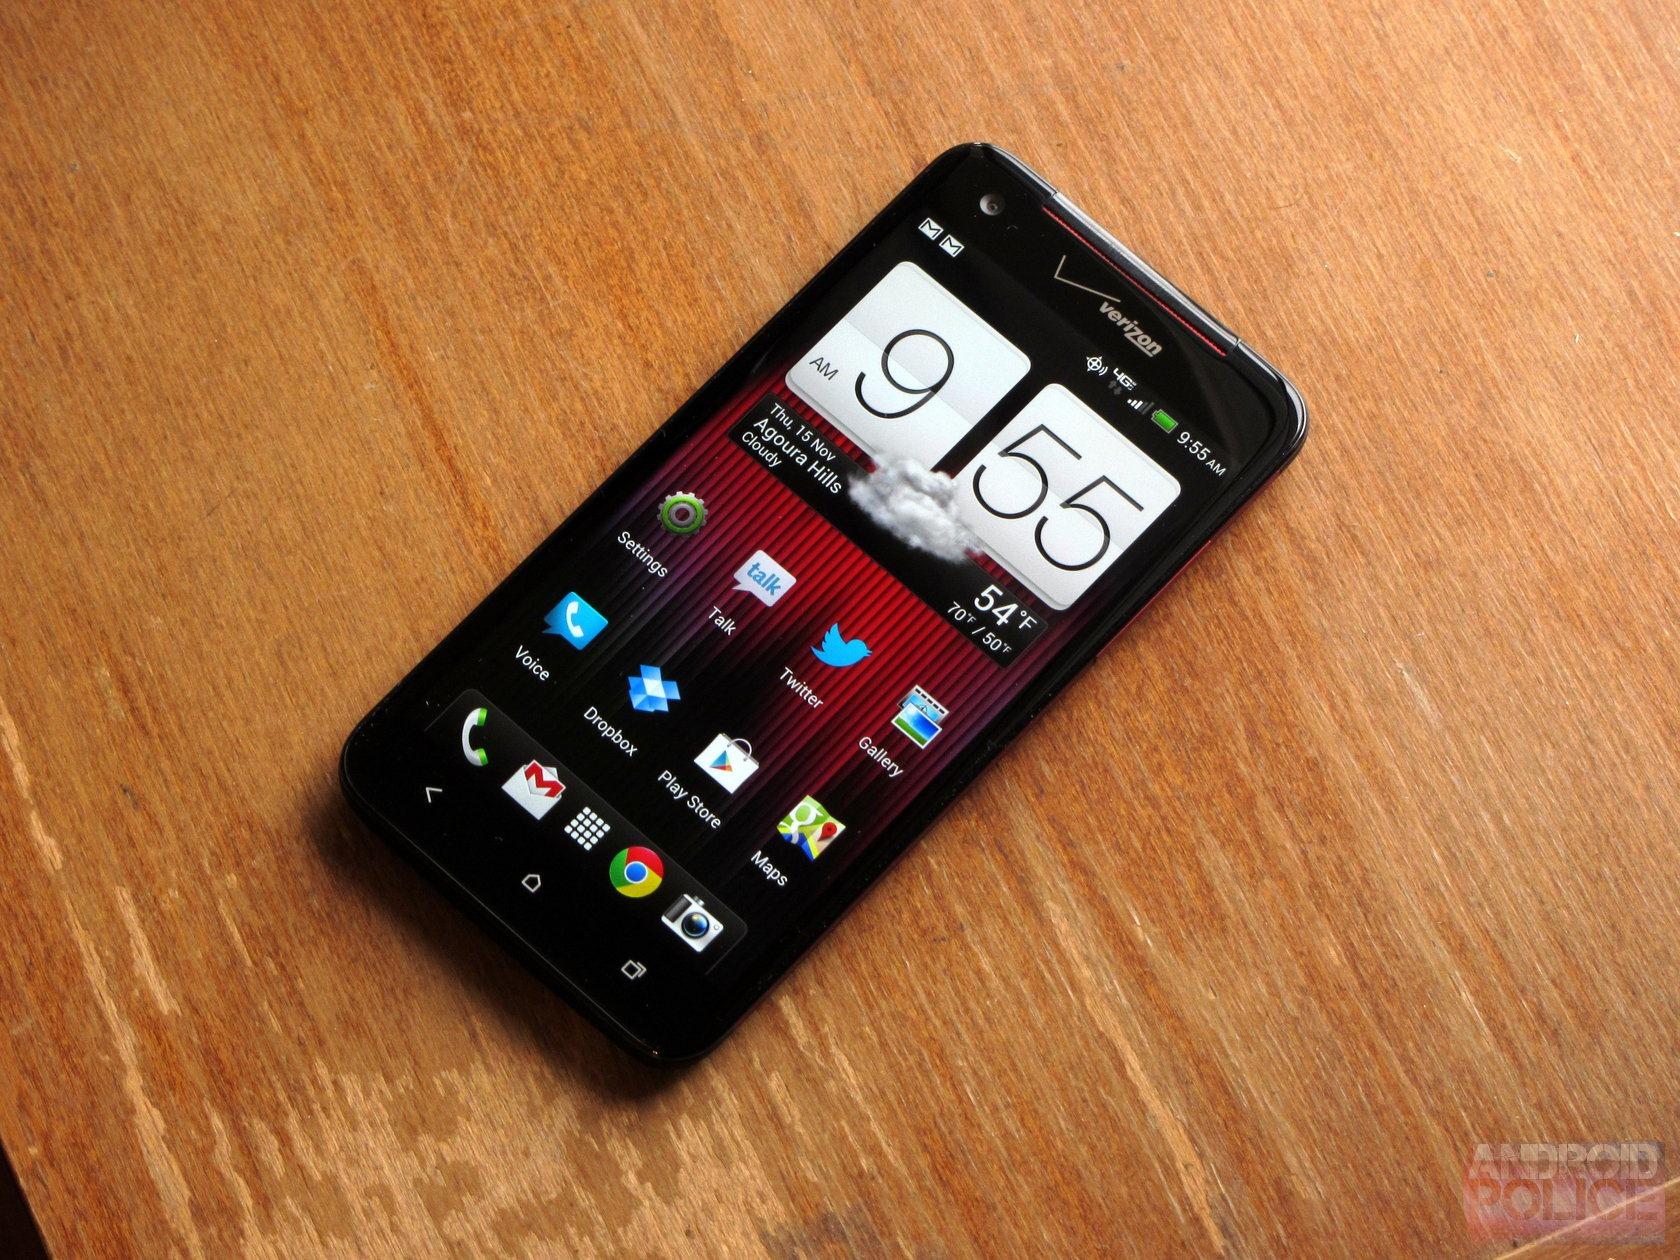 HTC Droid DNA im Test – Bestes Display aber kurze Akkulaufzeit